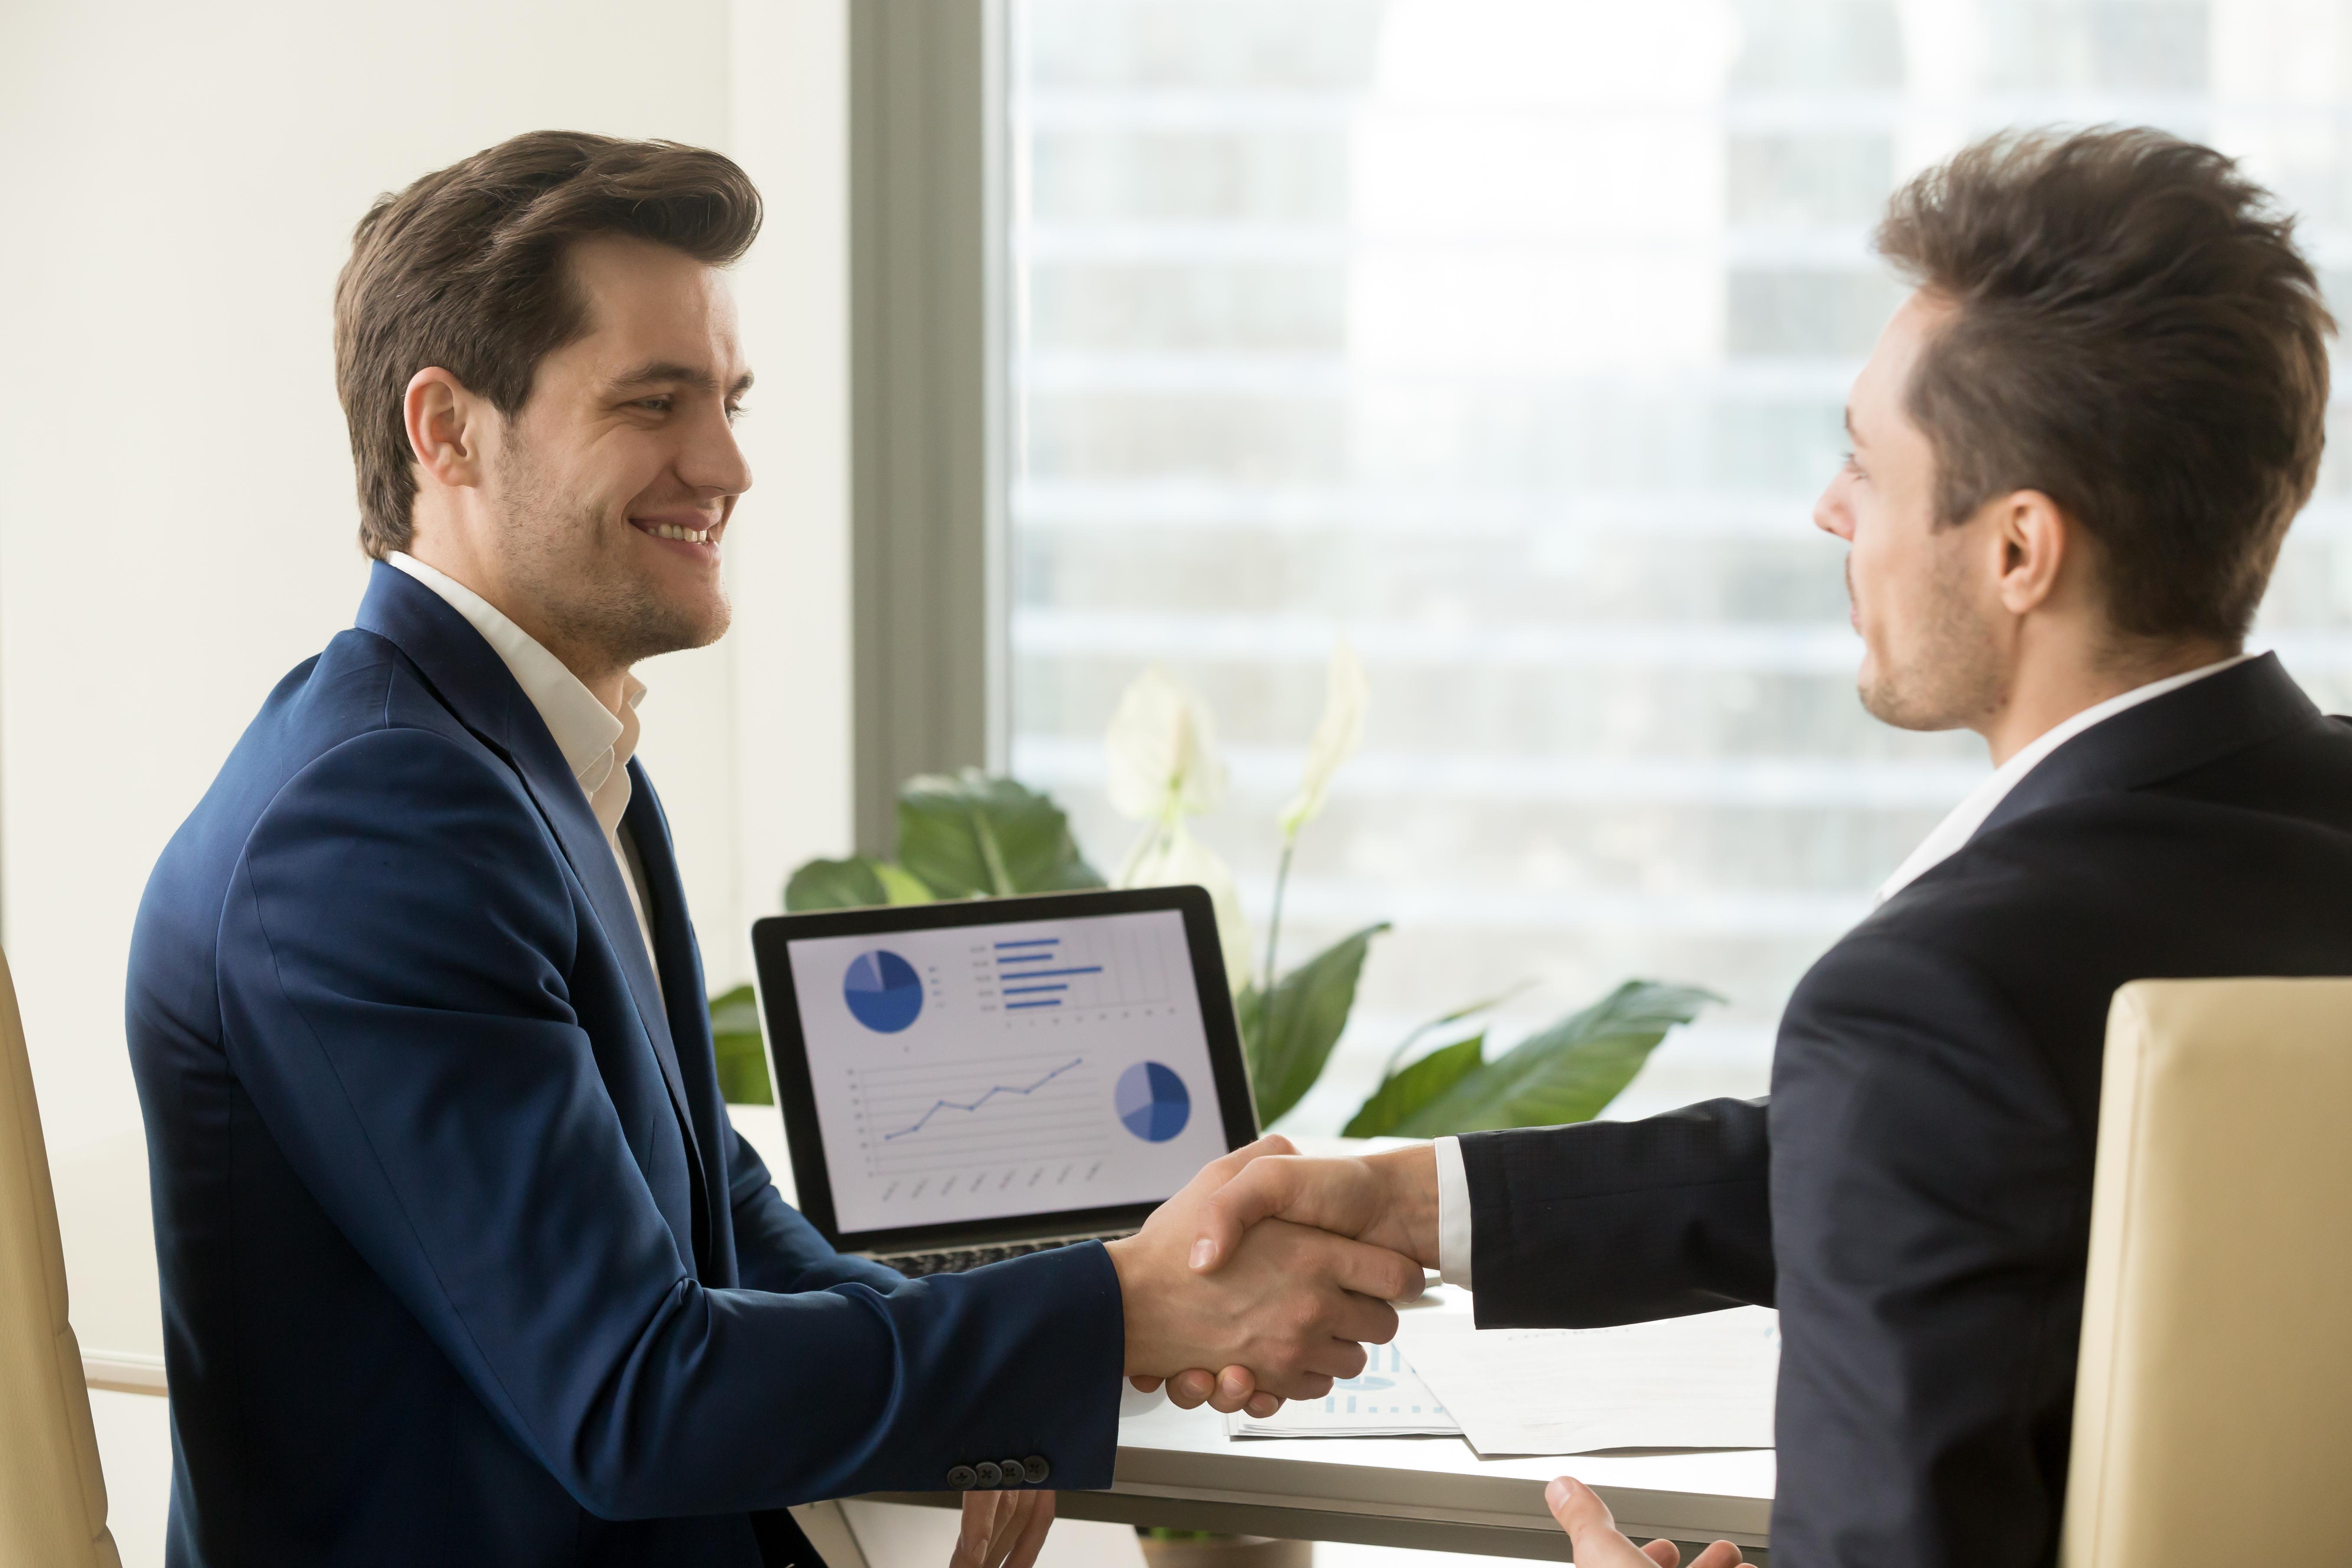 The Best List Broker Service Reviews of 2019